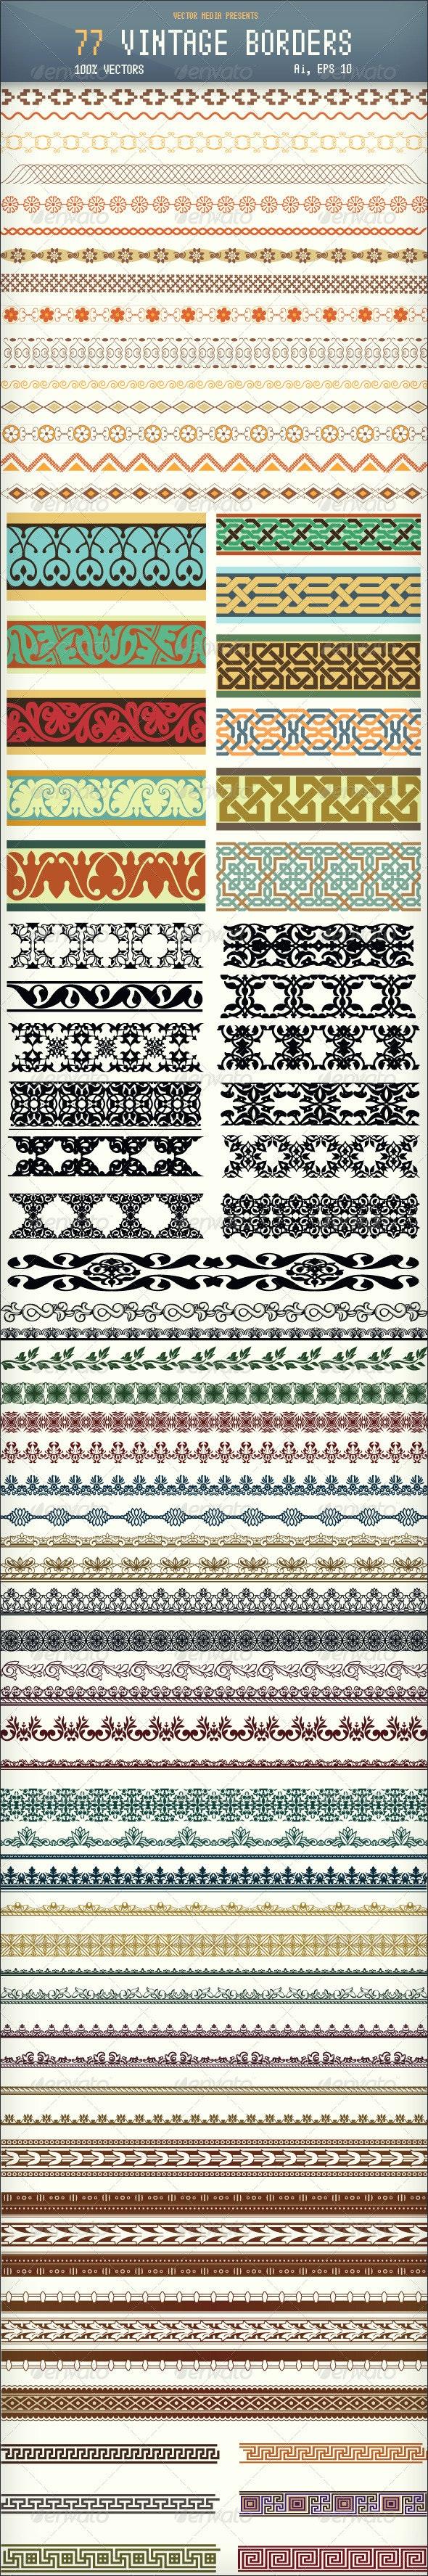 77 Vintage Borders - Borders Decorative